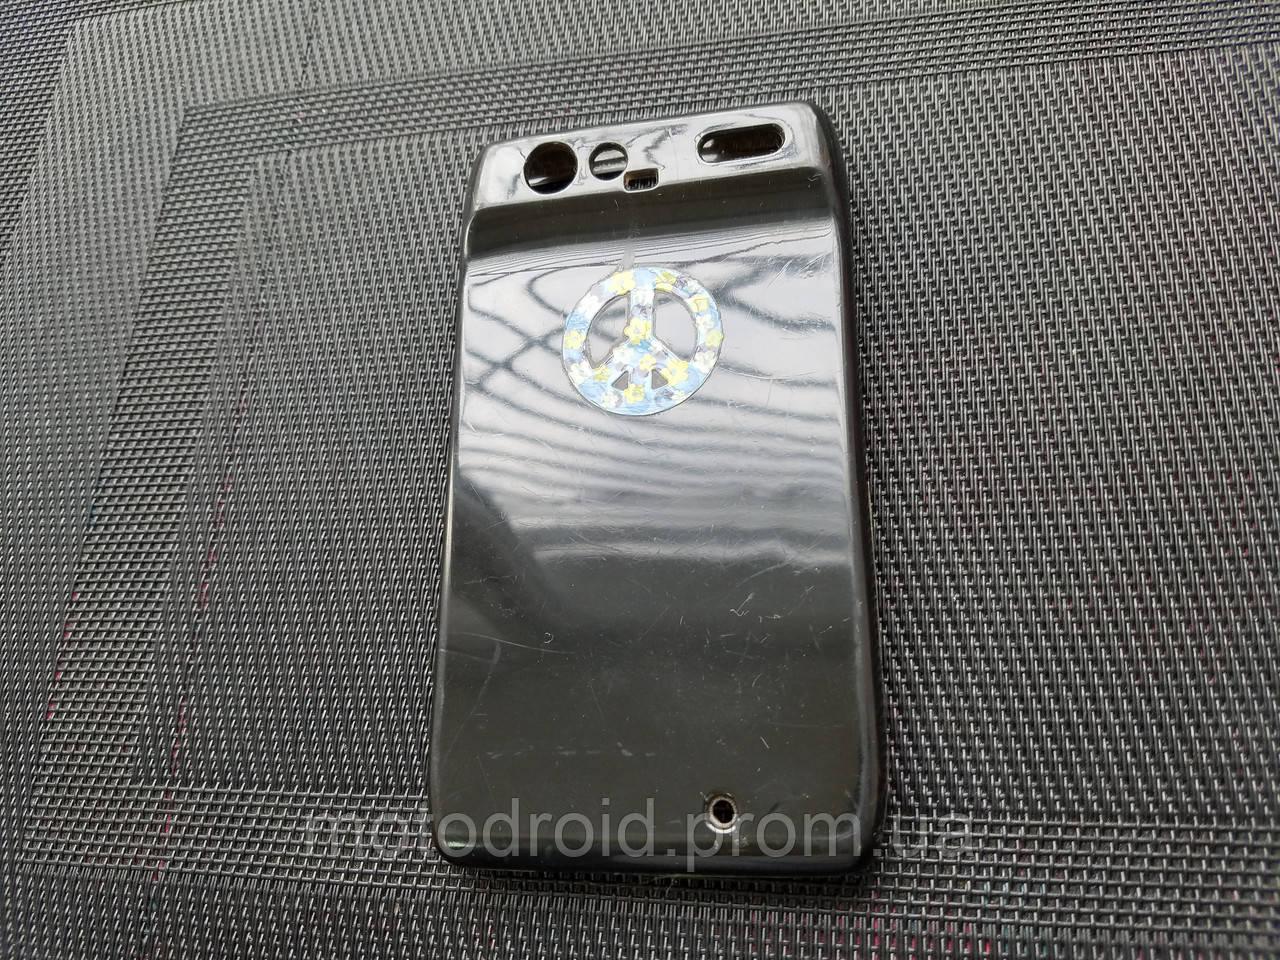 Чехол  Motorola Droid Razr  Maxx XT912m